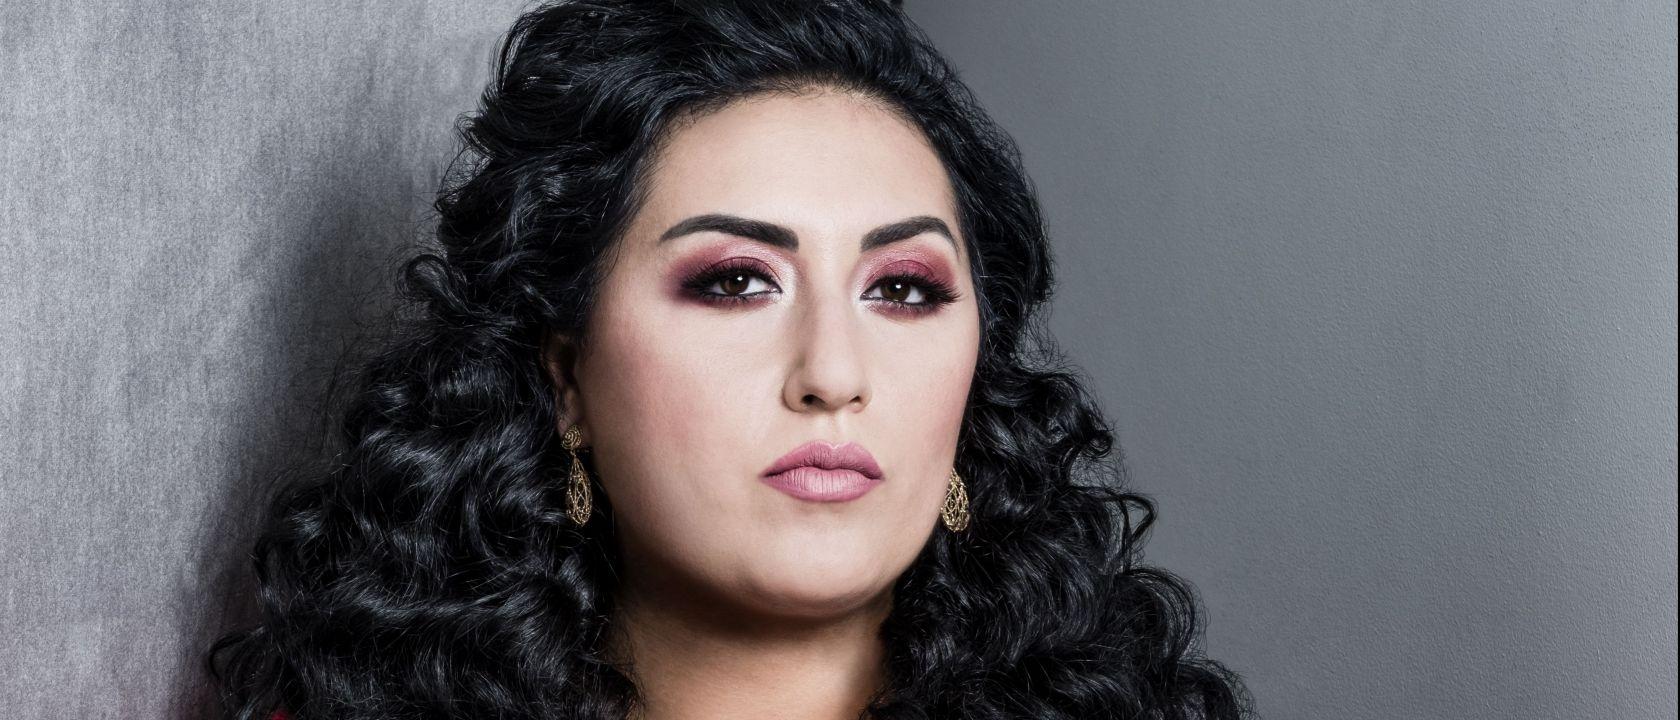 Анита Рачвелишвили (меццо-сопрано)